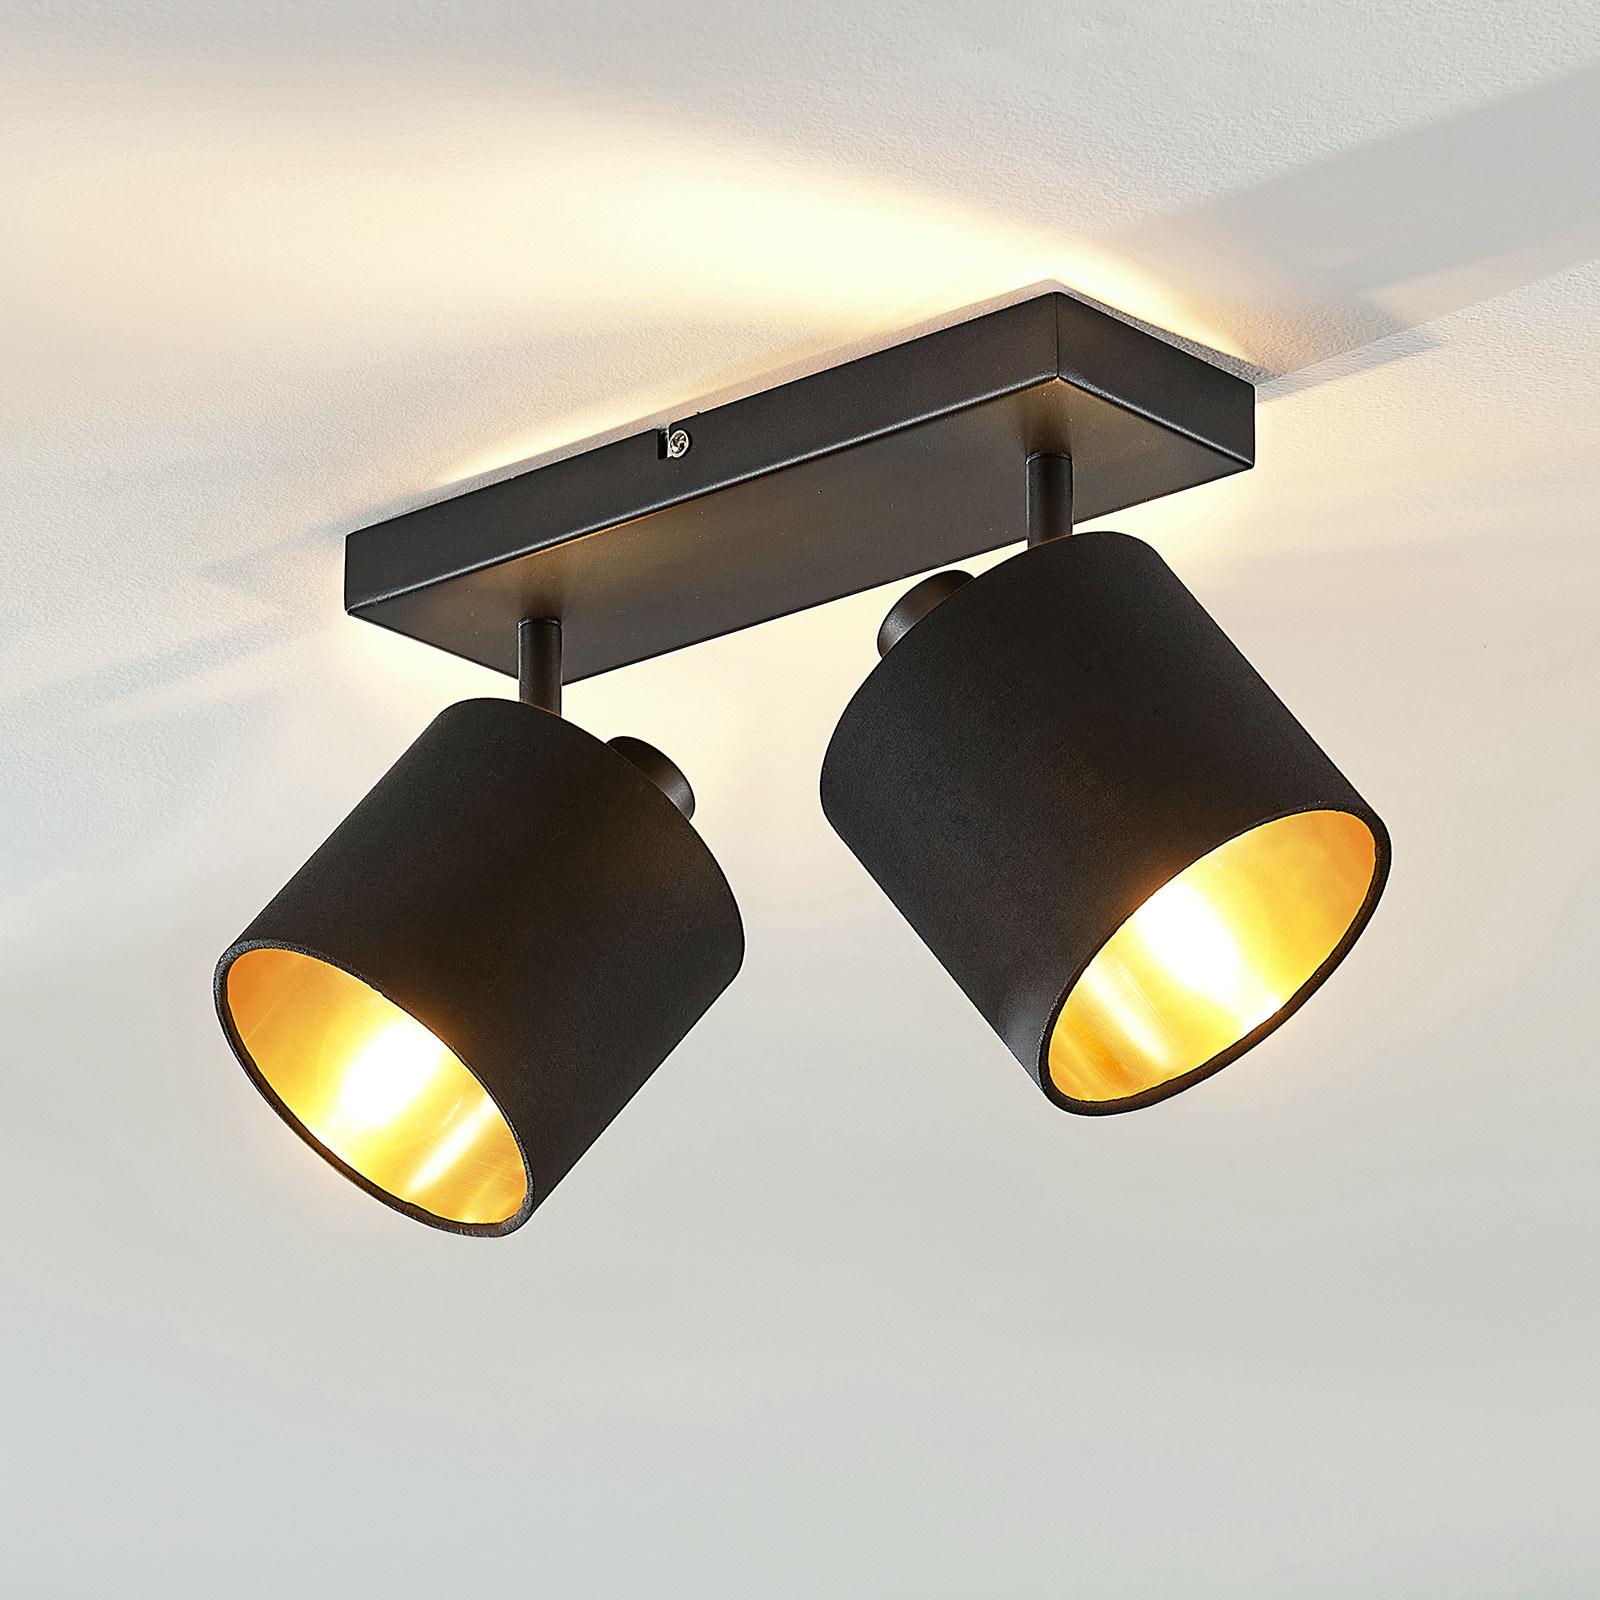 Væglampe Vasilia i stof, sort-guld, 2 lyskilder